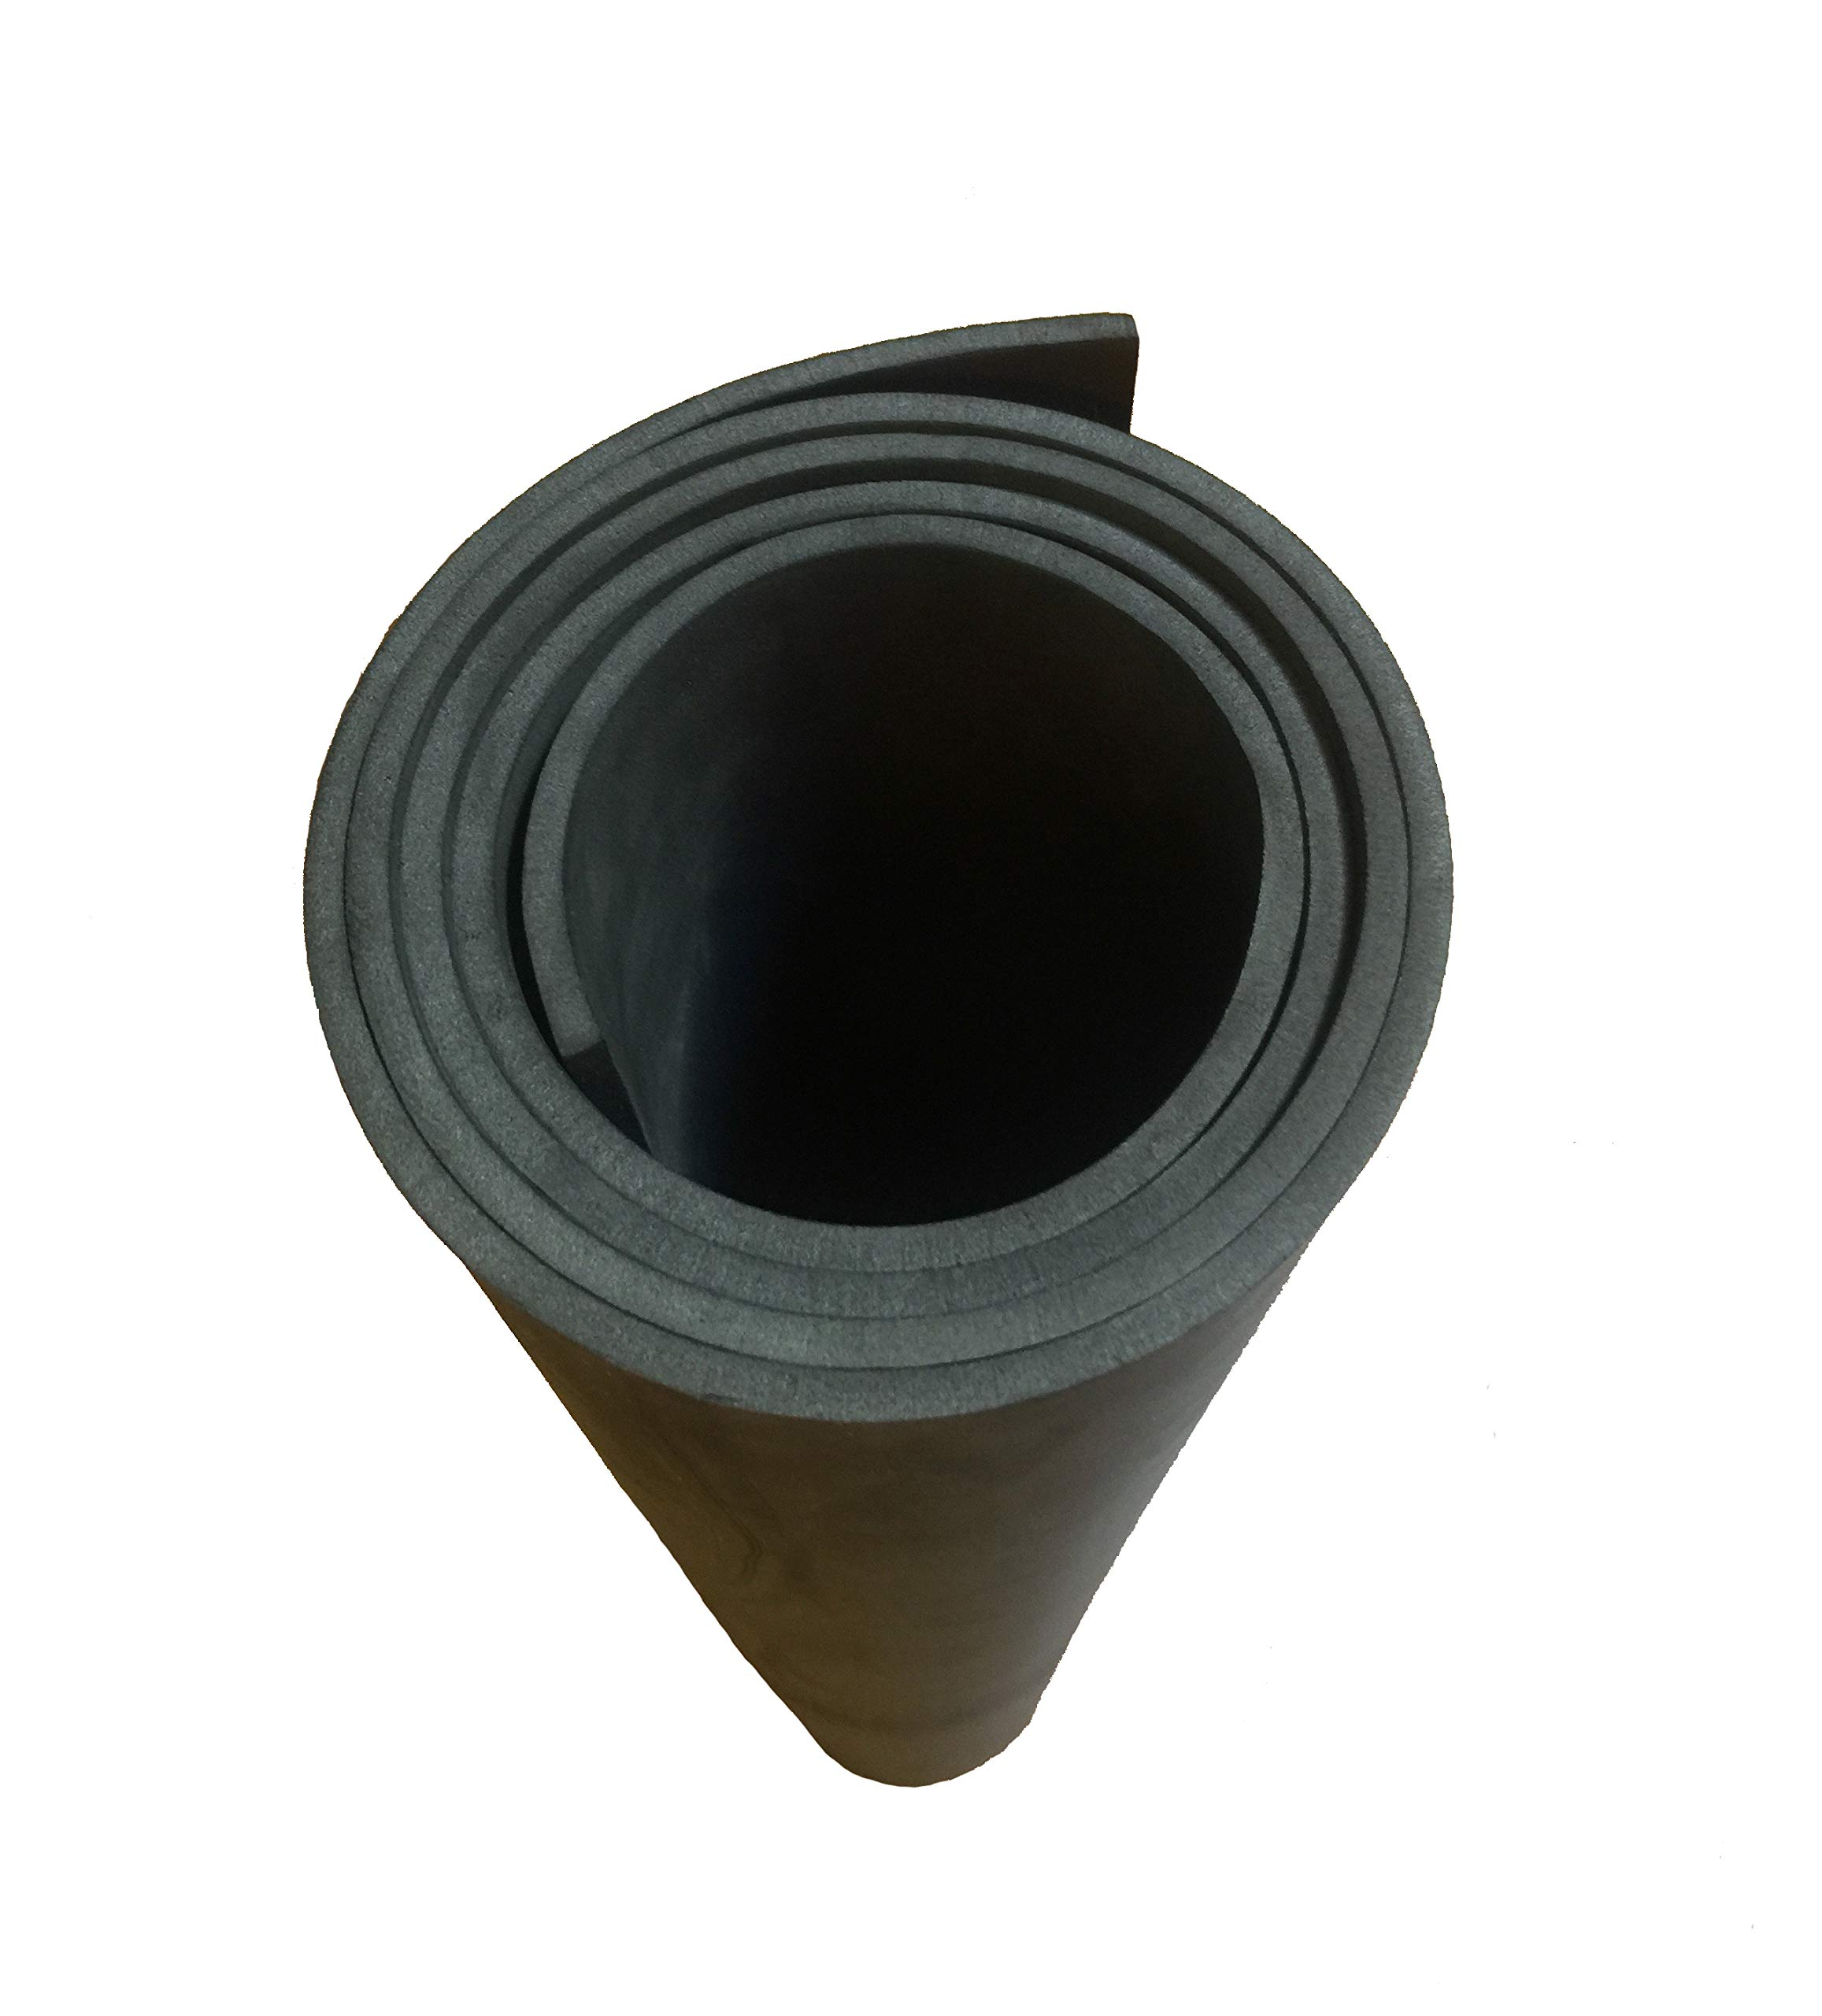 EVA Foam Cosplay 6mm Black 35 x 59 inch Sheet (Ultra High Density) product